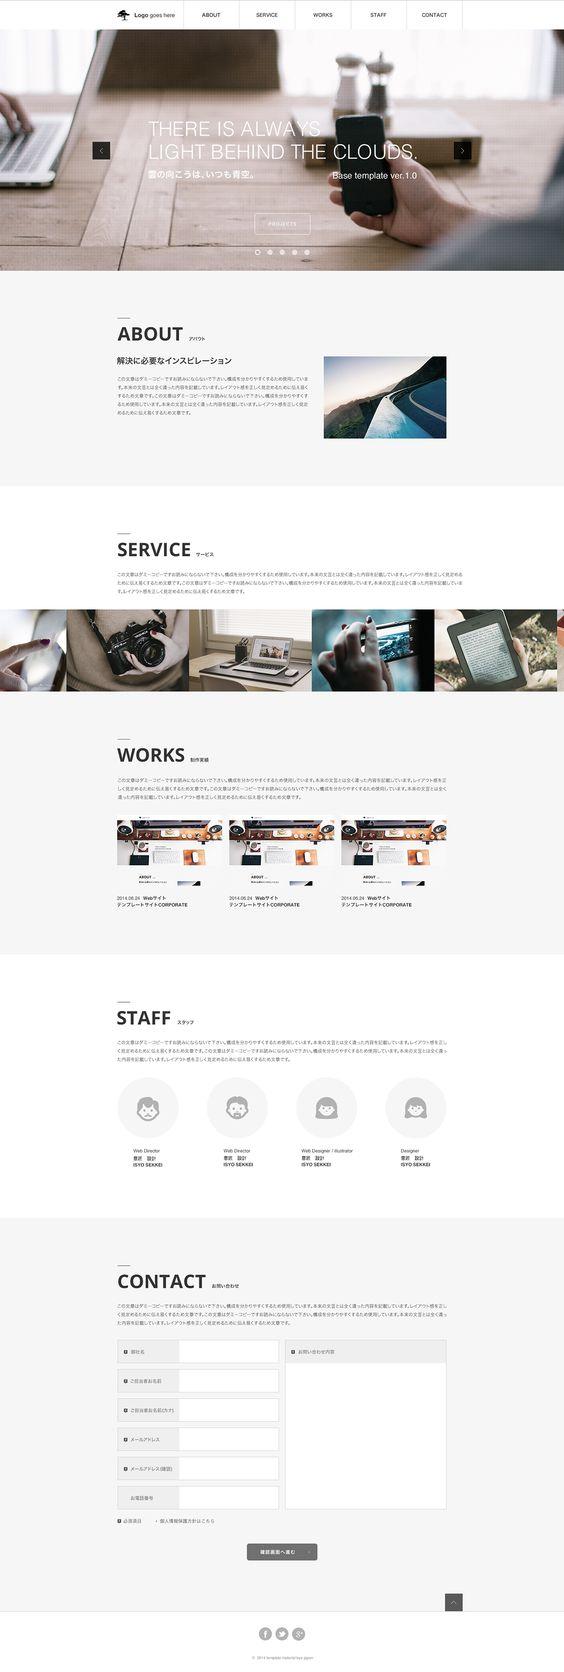 Web Design PSD Template ver.0.5 on Behance